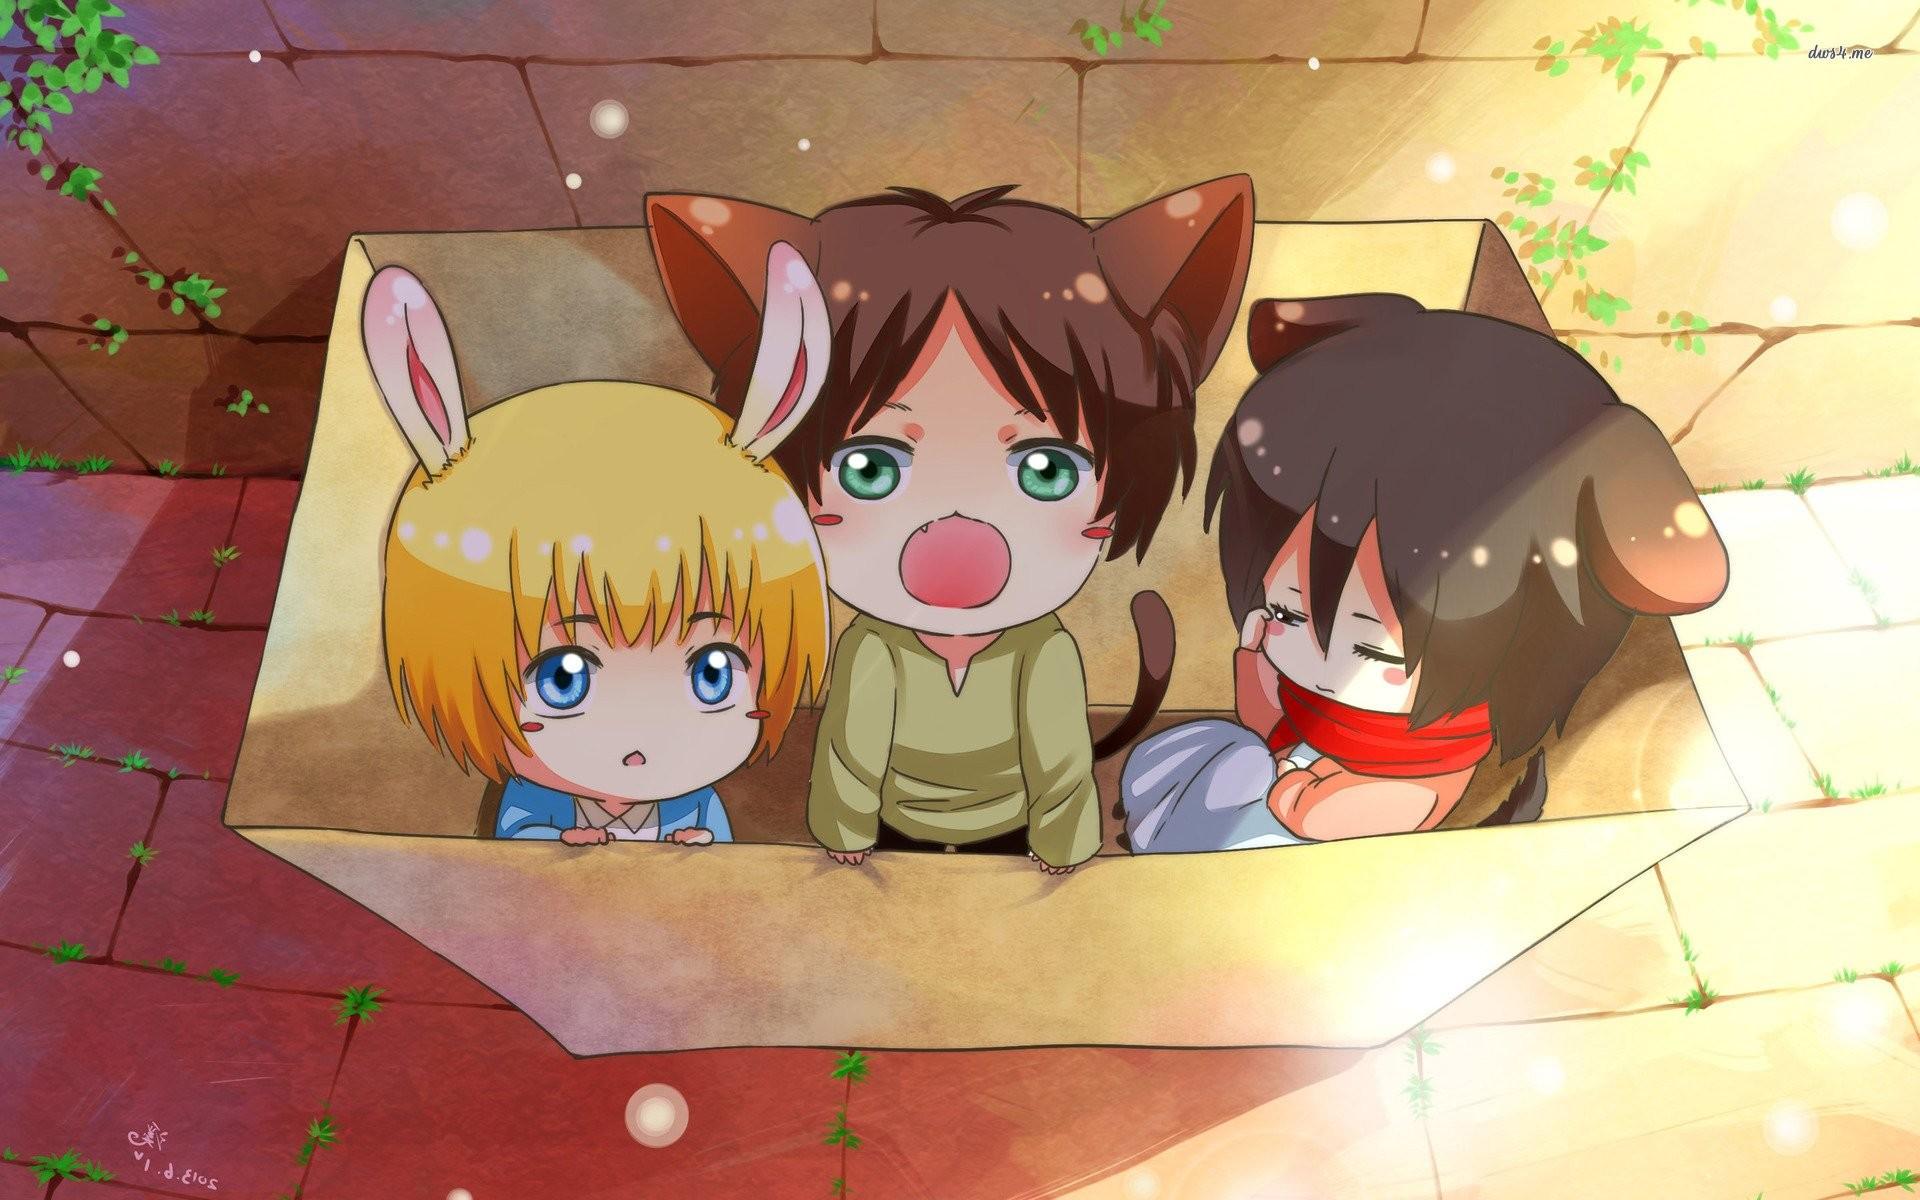 Attack on titan anime cute wallpaper     1027638   WallpaperUP